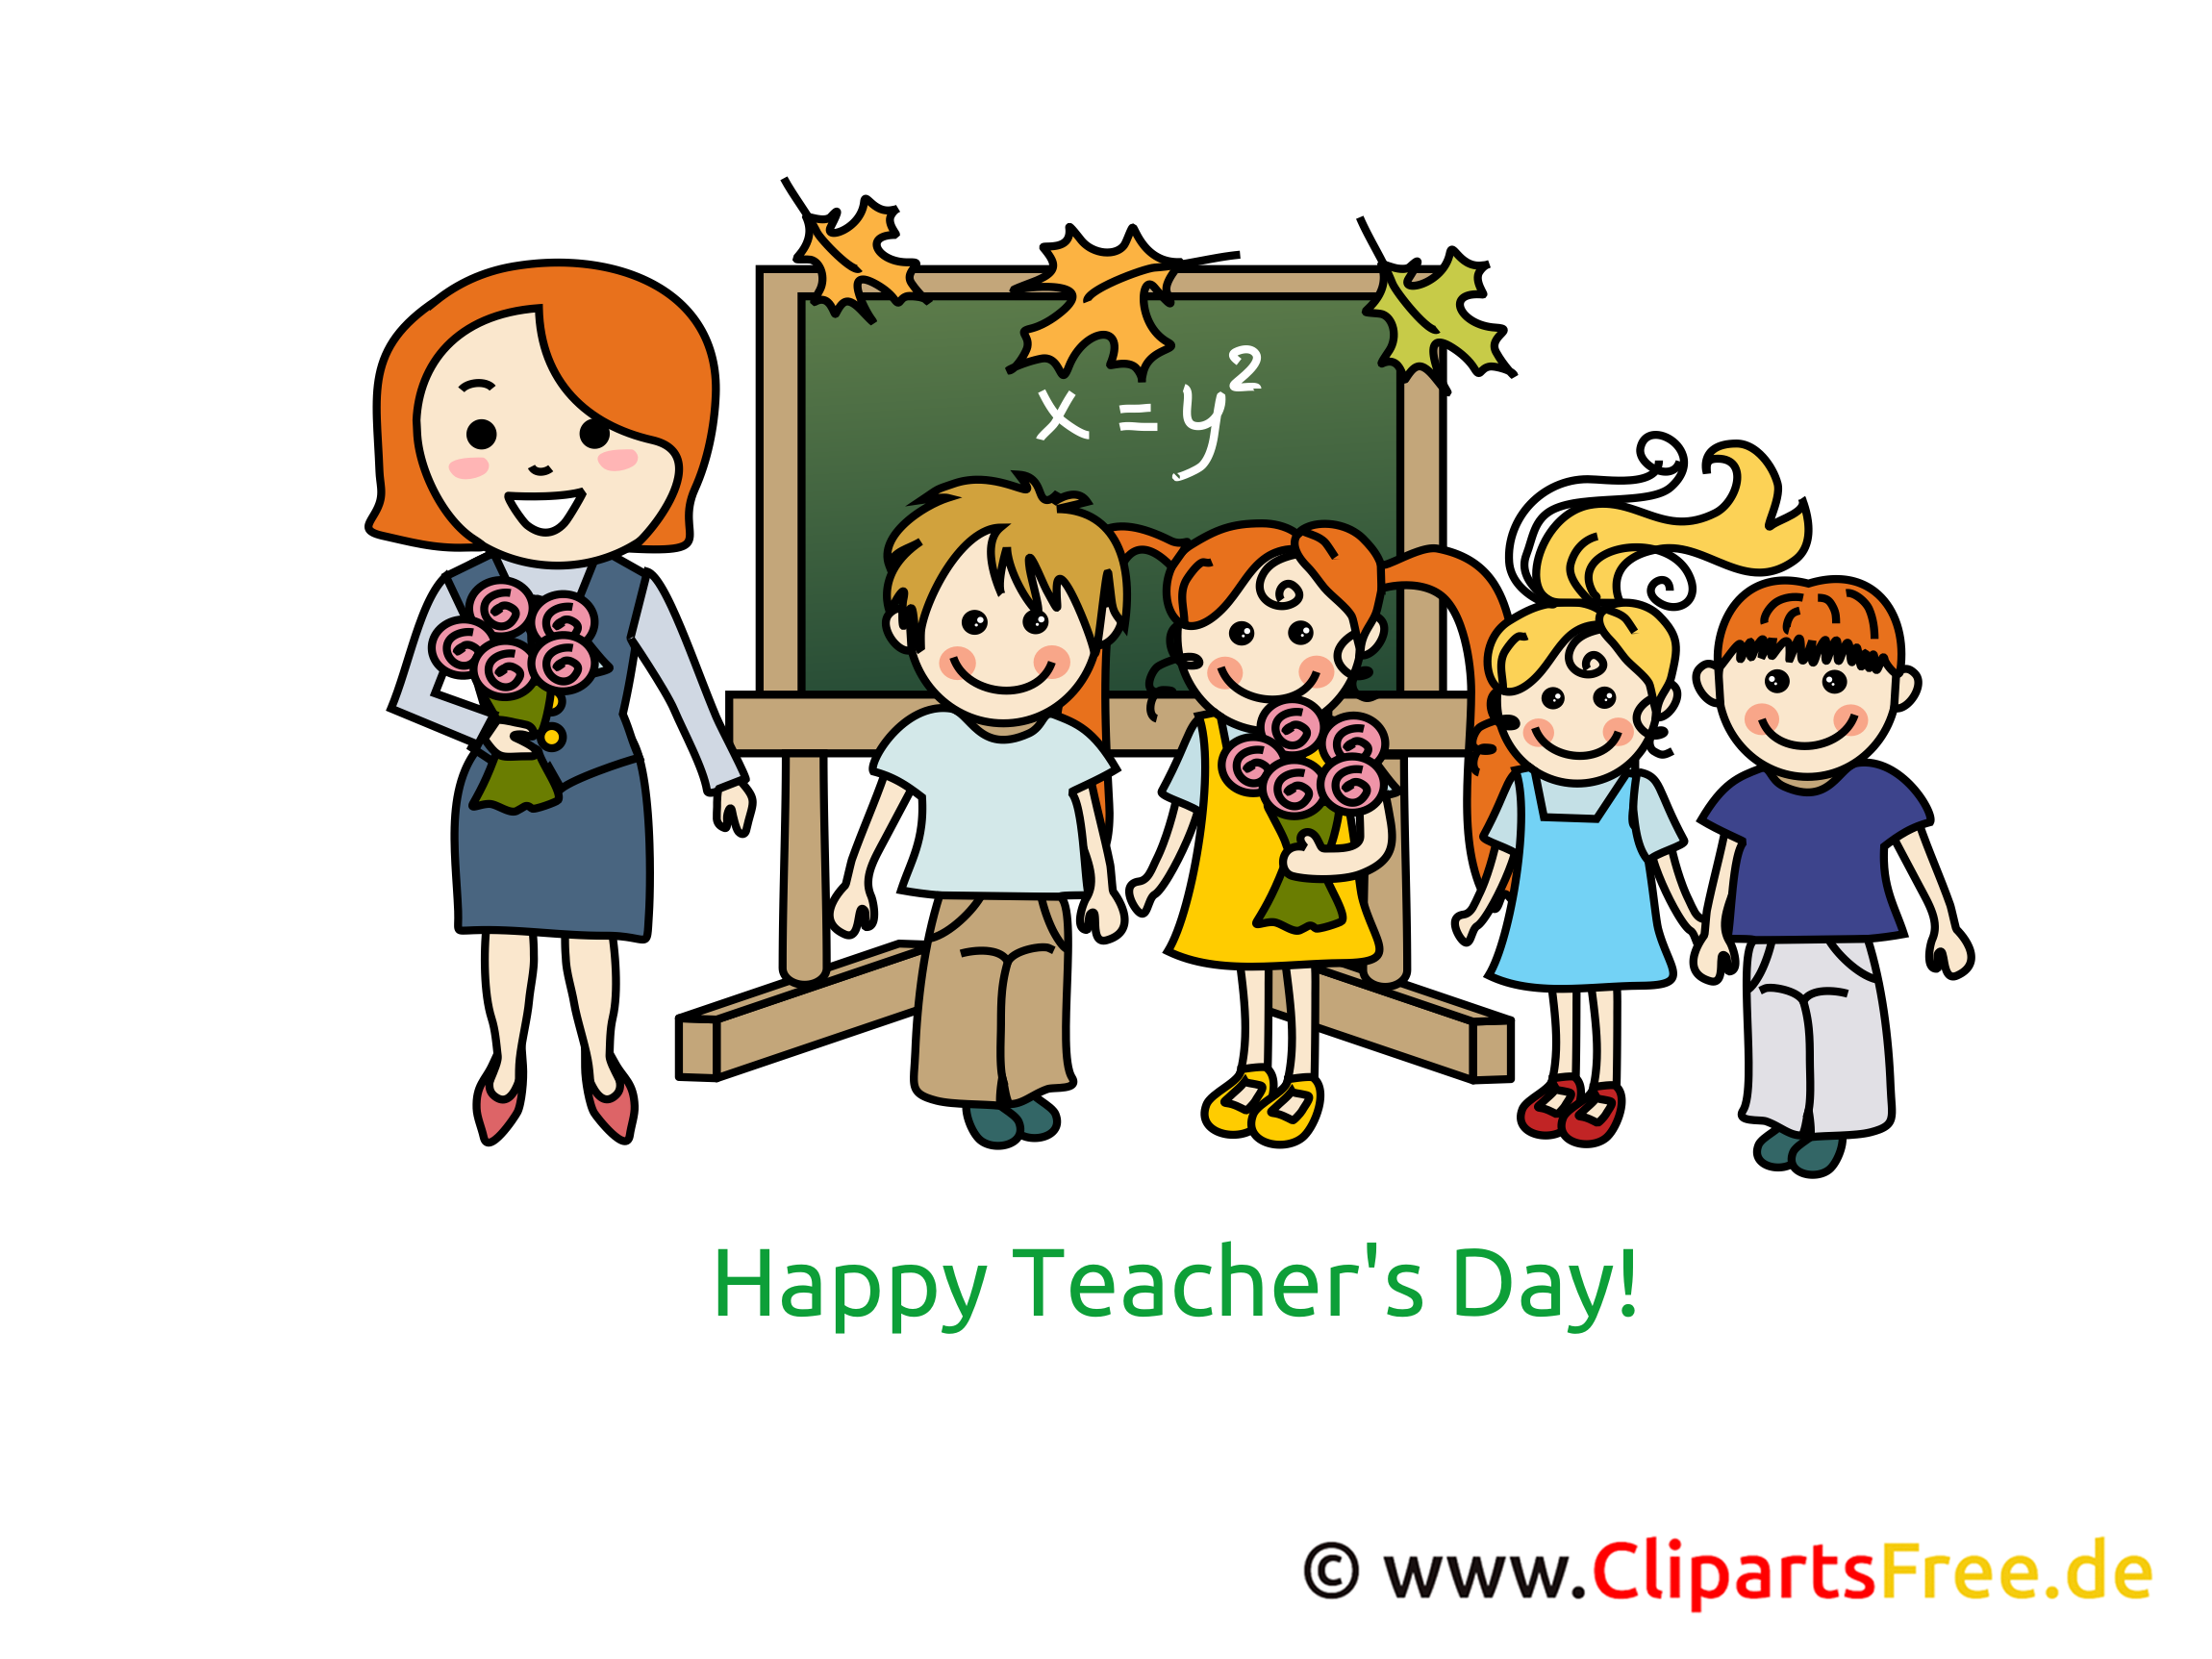 Teachers Day Clip Card, Art, Pic